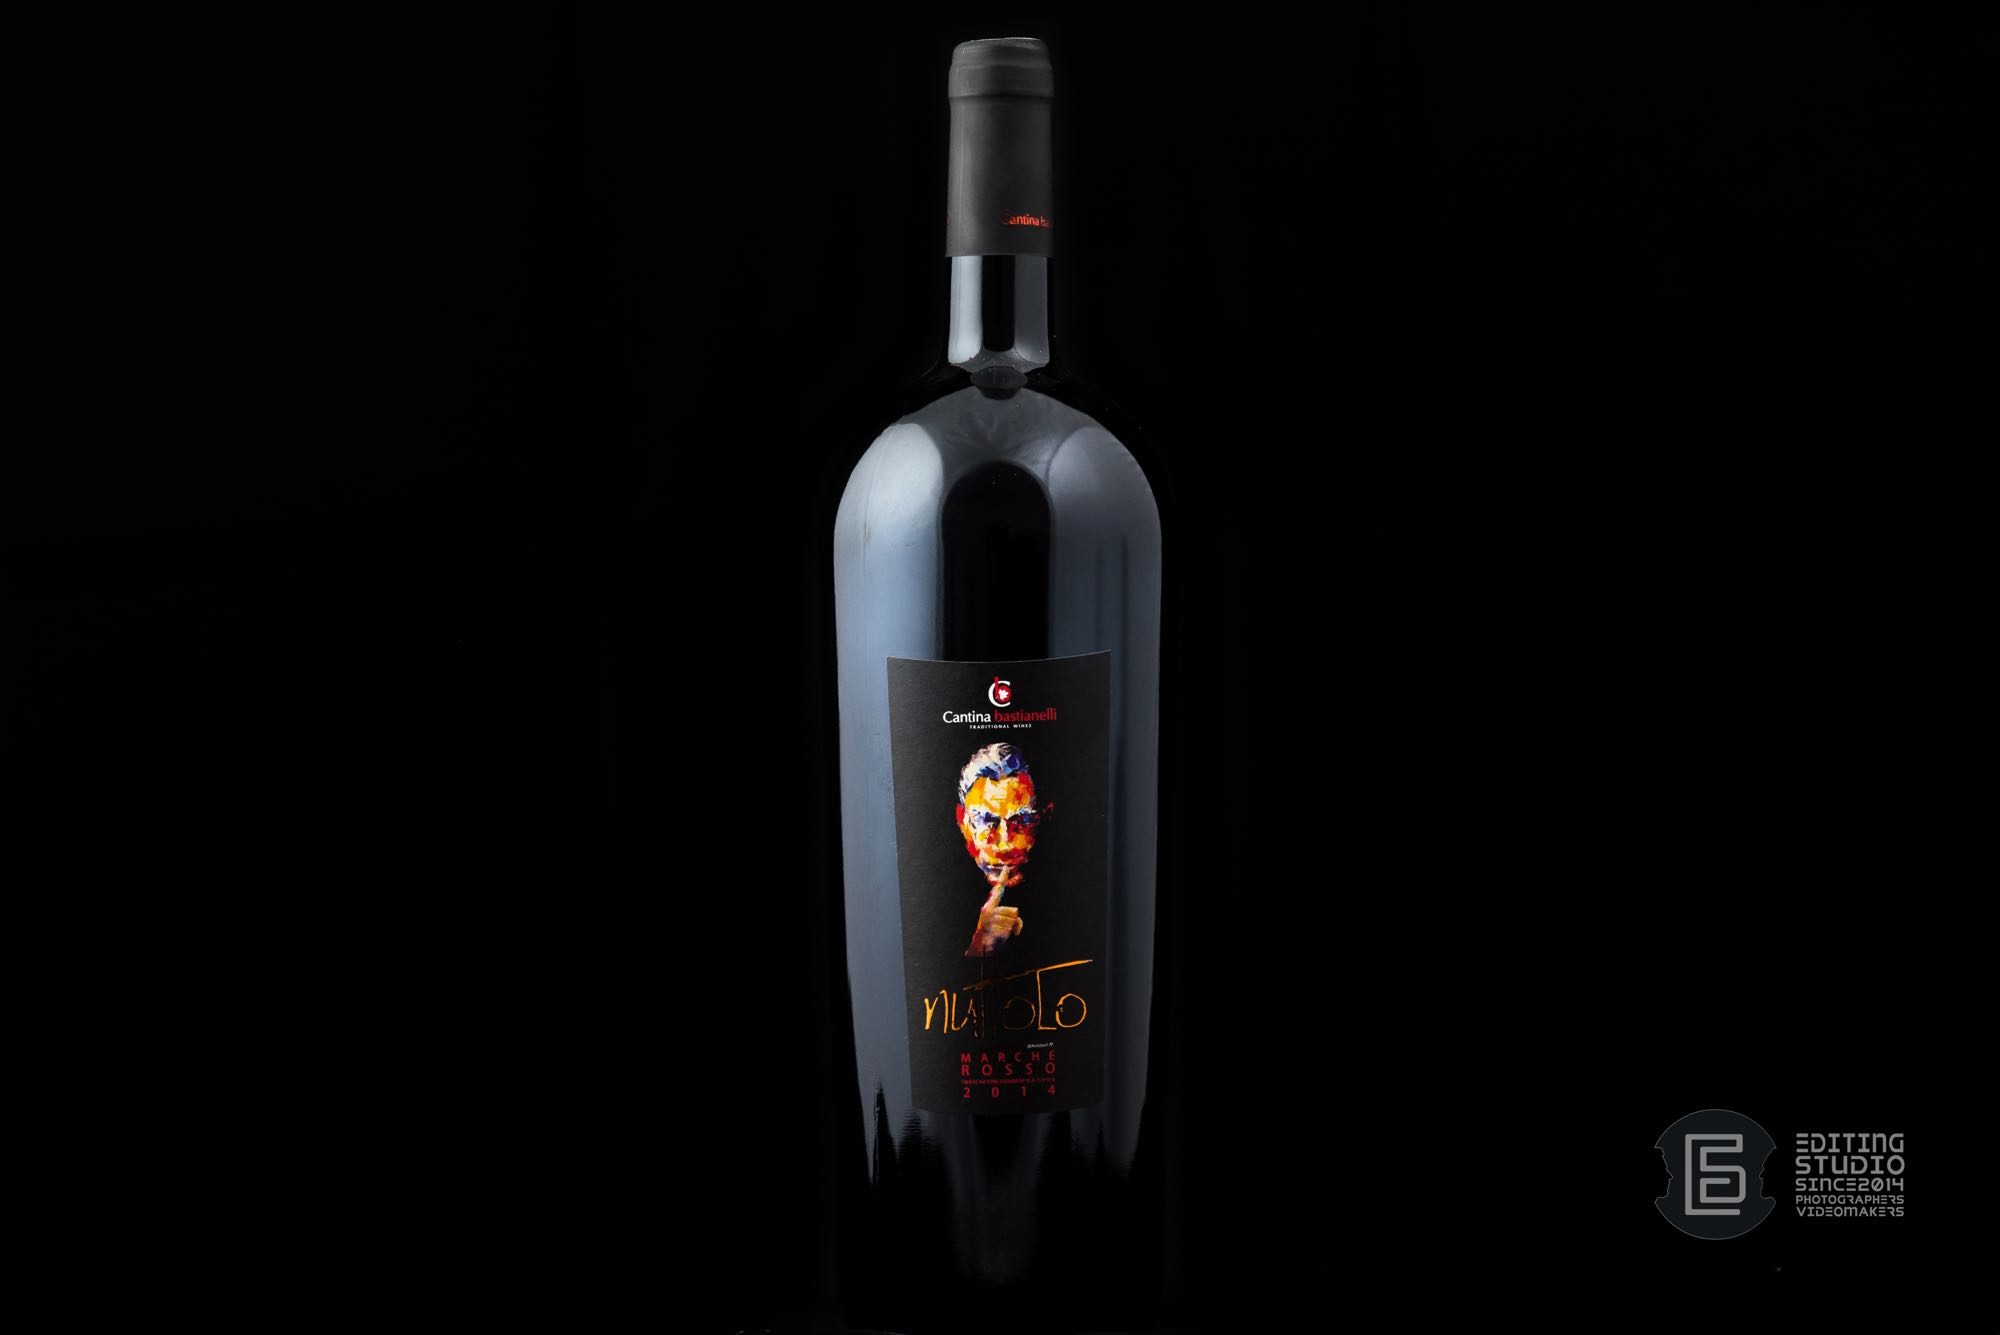 Bottiglie old09